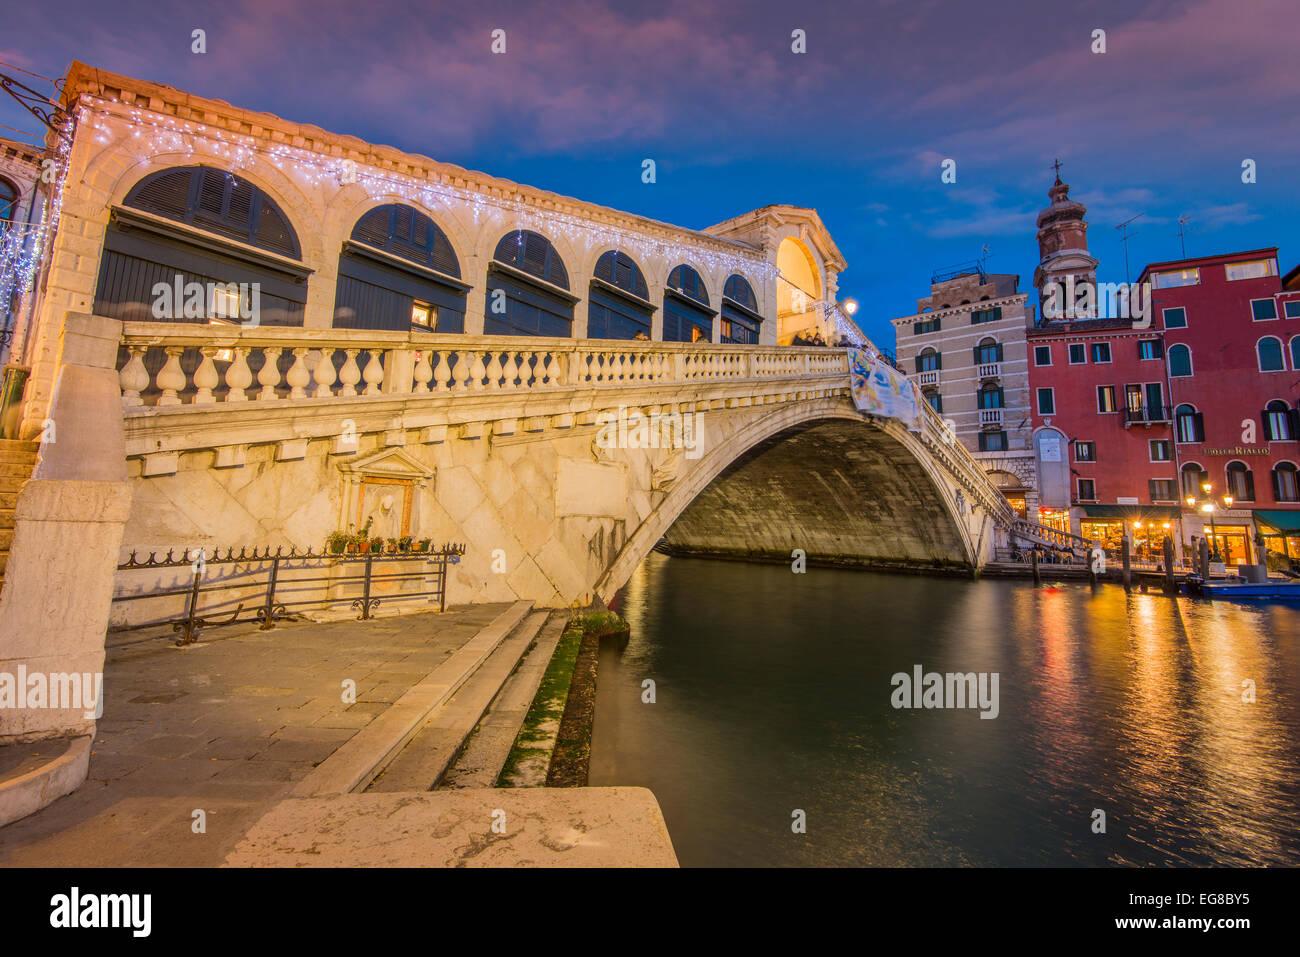 Rialto-Brücke in der Abenddämmerung, Venedig, Veneto, Italien Stockbild